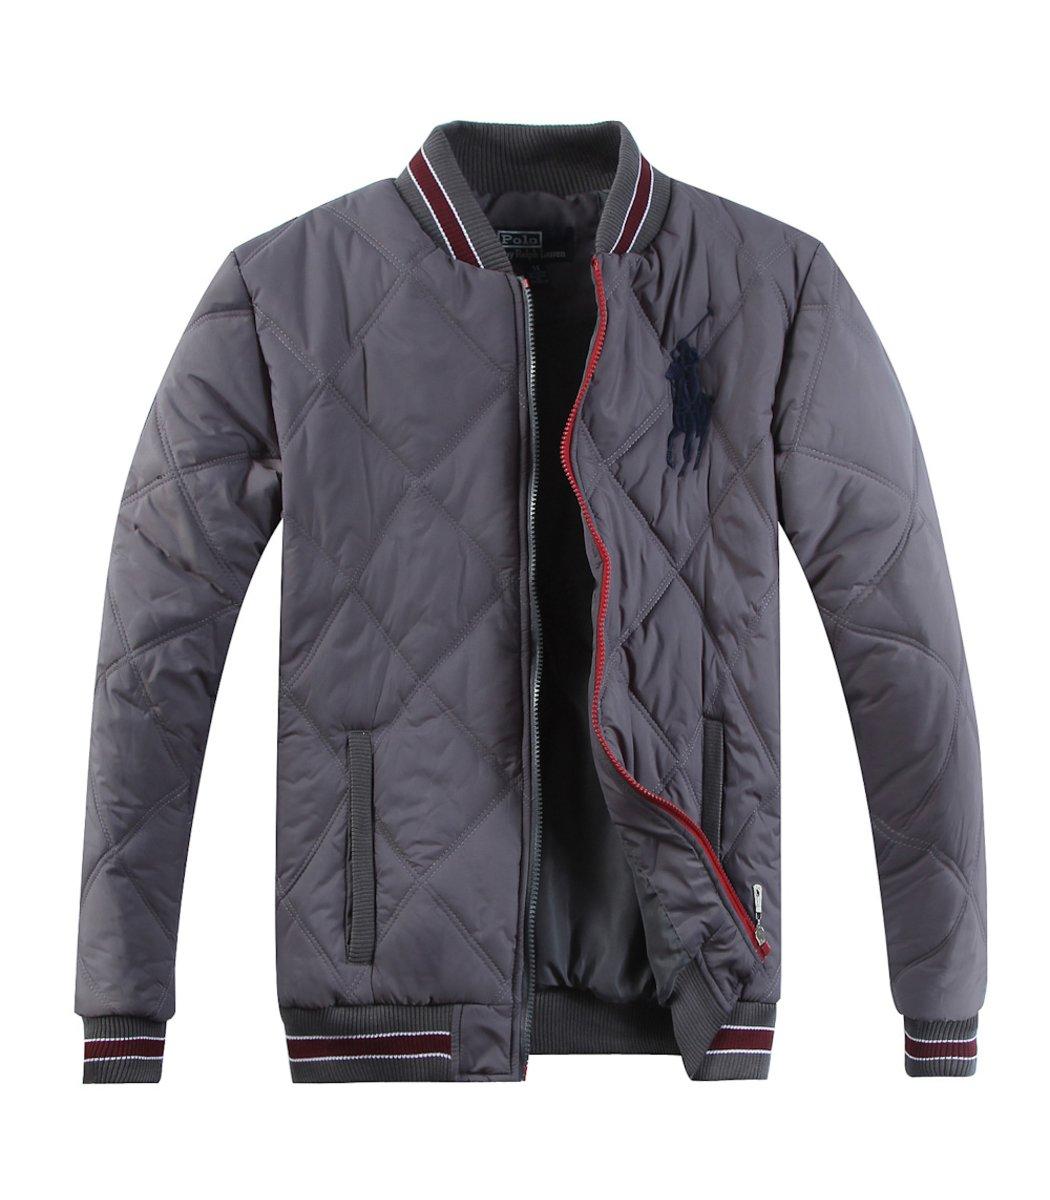 Куртка-бомбер POLO Ralph Lauren KR4 (Серый)